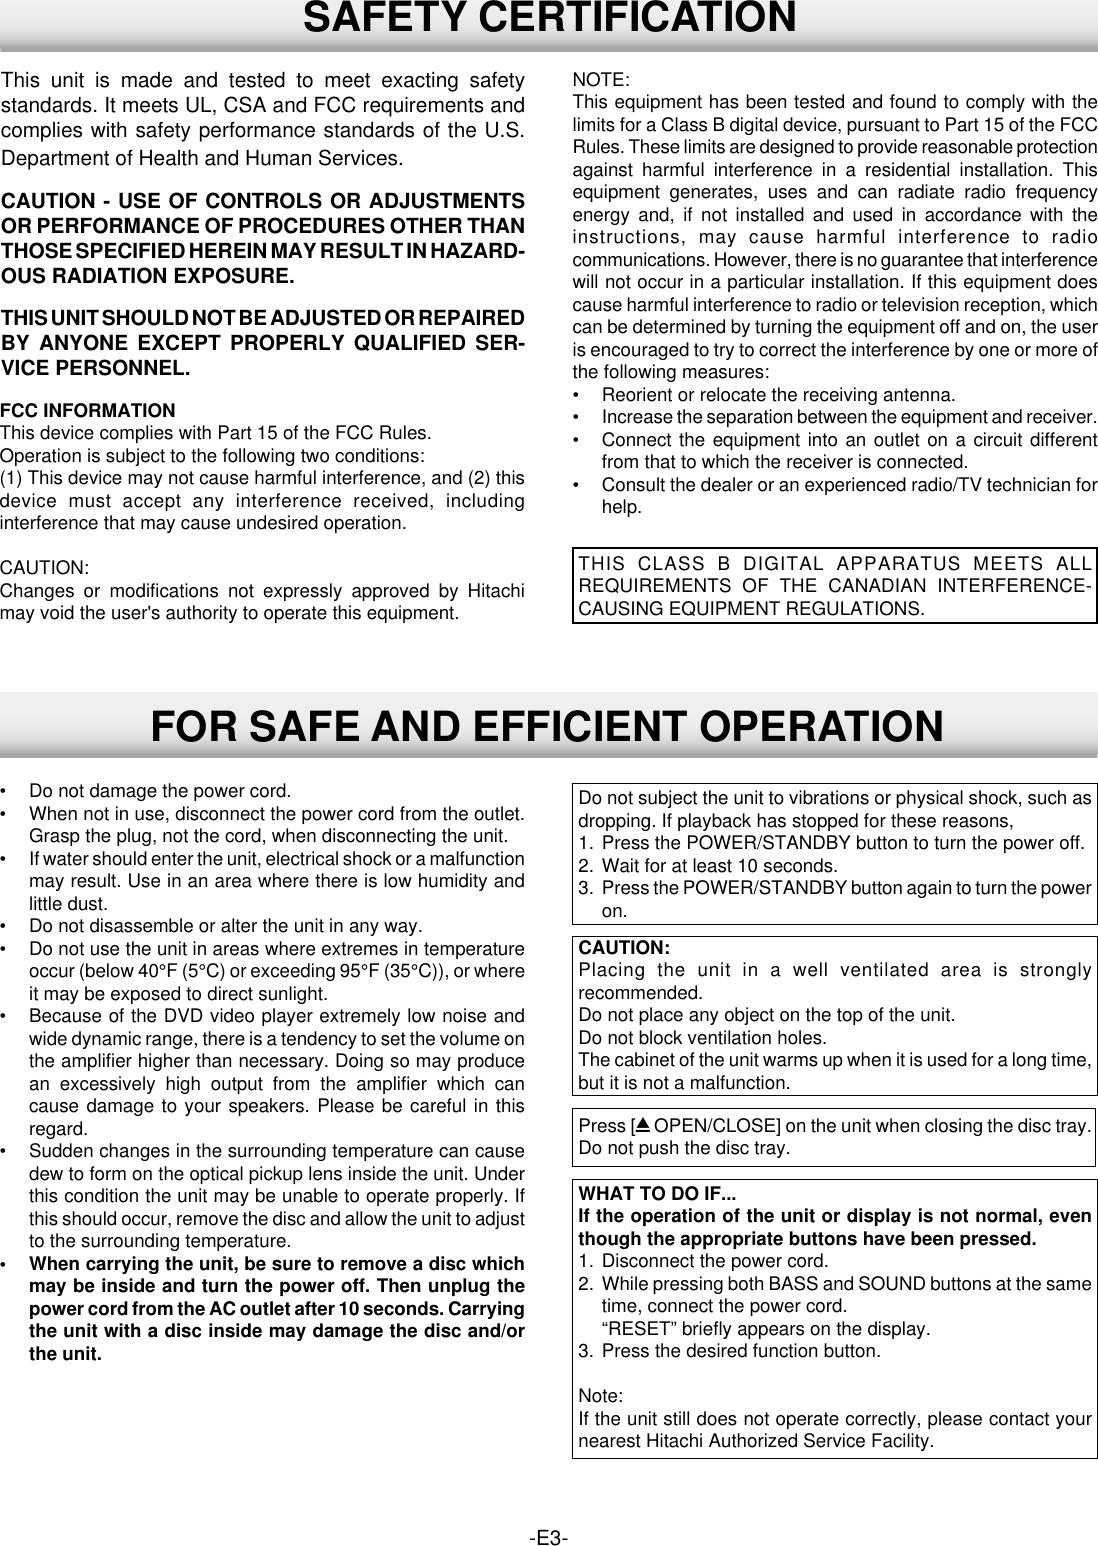 Hitachi Dv S522U Users Manual 5201/US Cover (Eng)